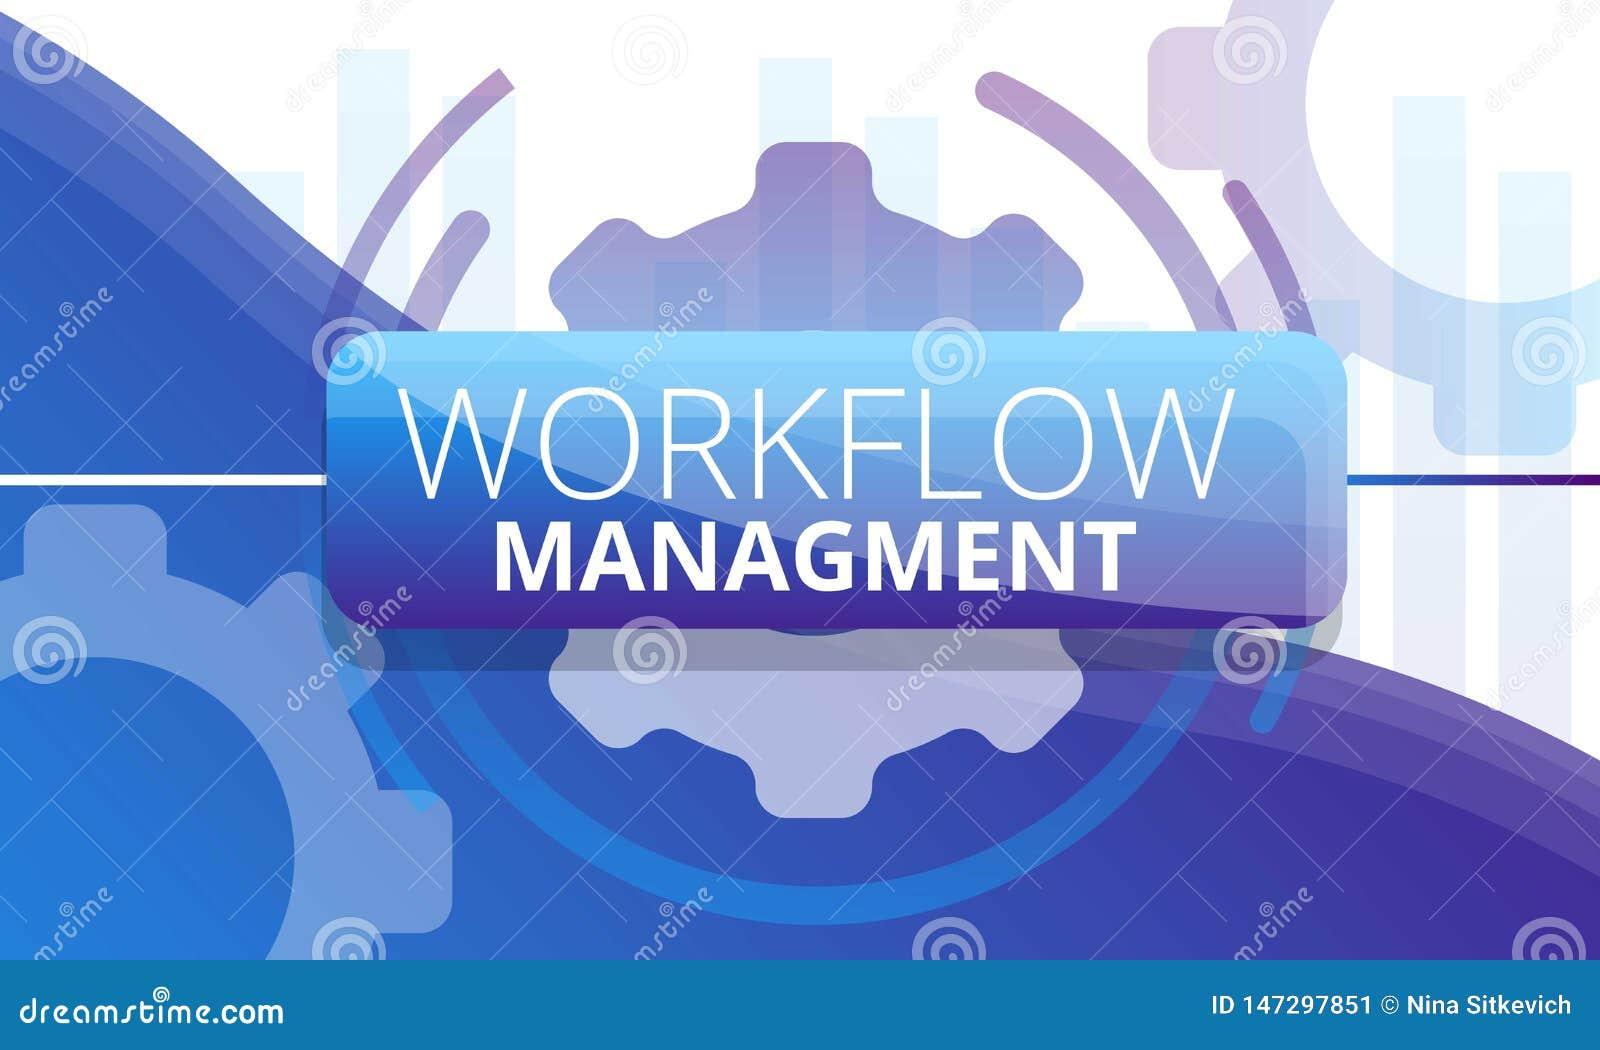 Workflow management concept banner, cartoon style